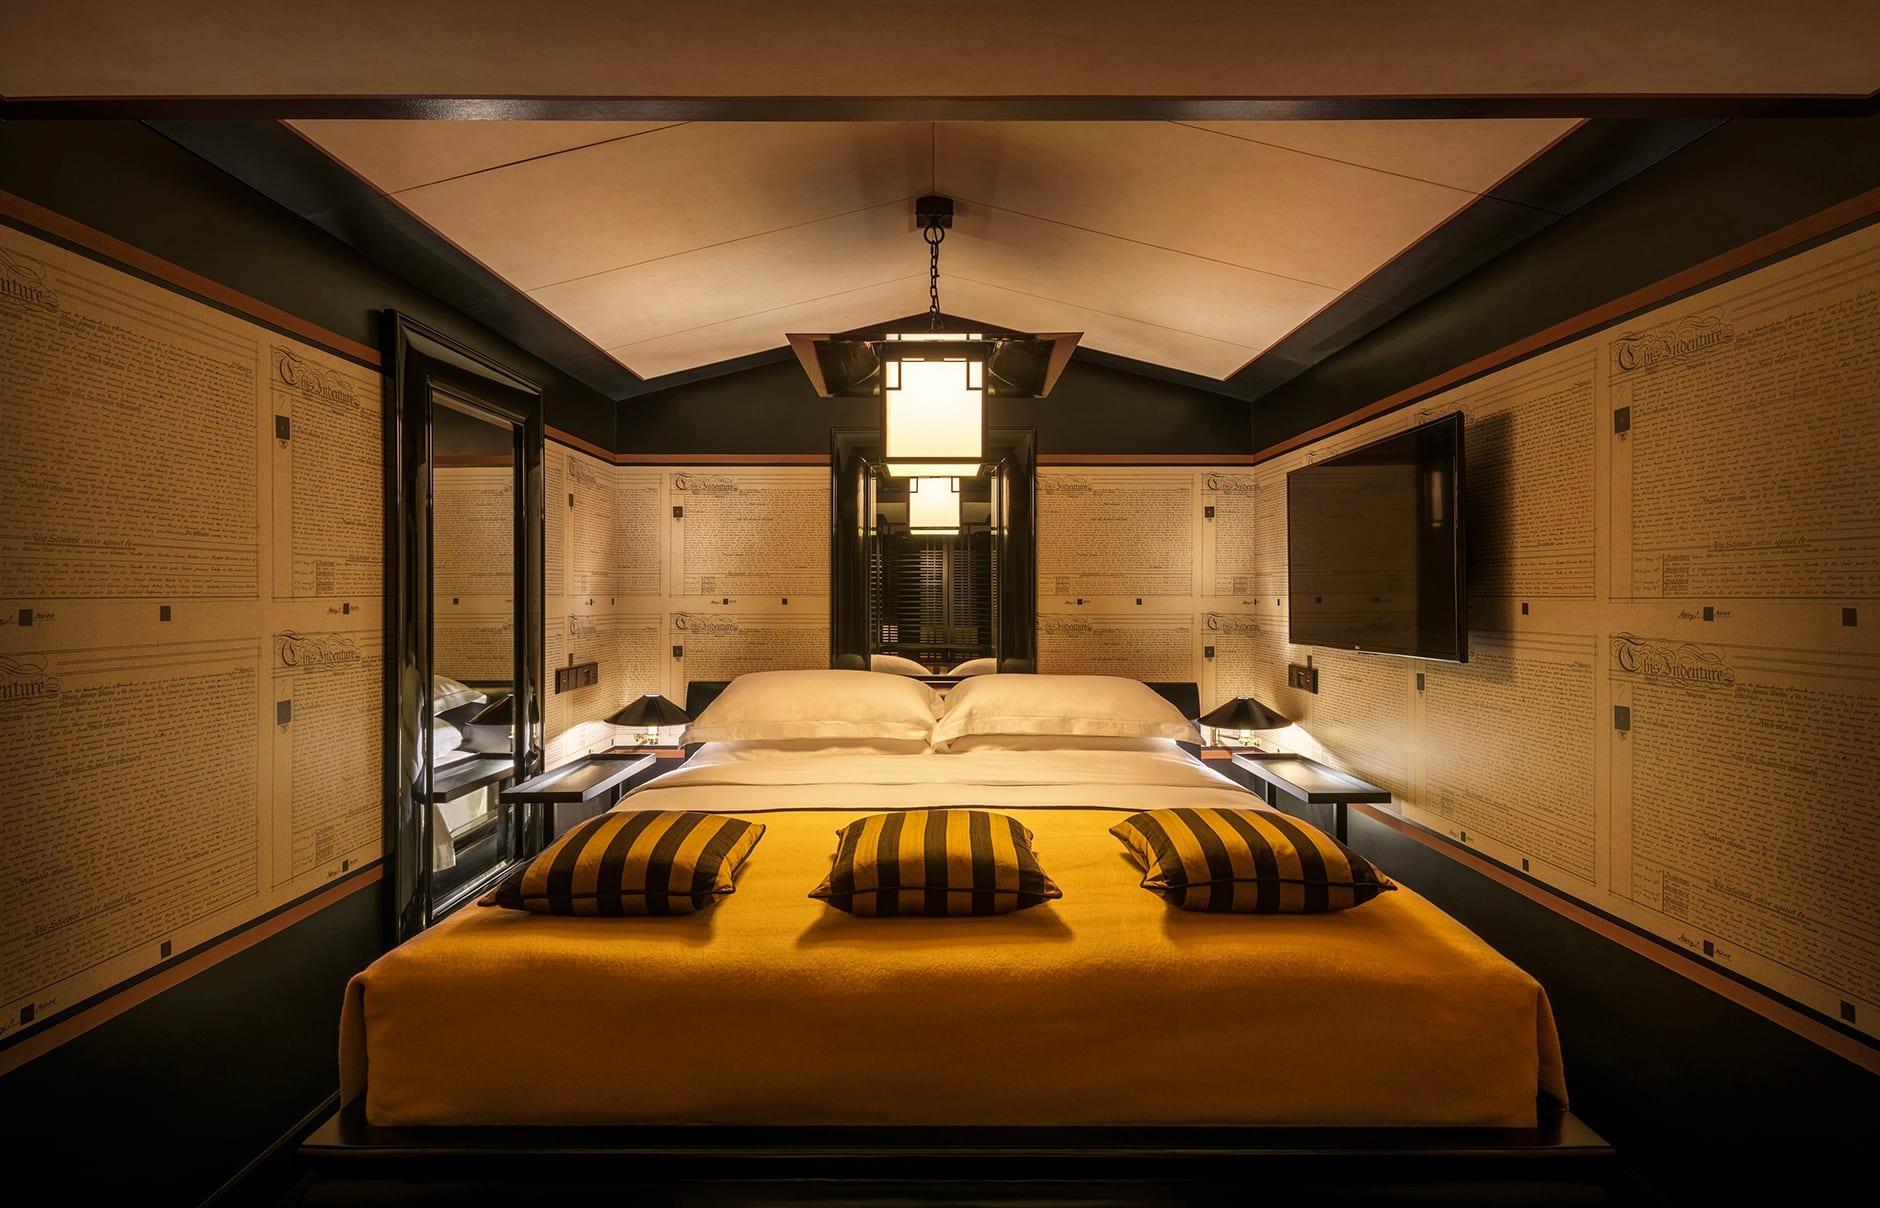 Six Senses Duxton, Singapore. Opium Suite bedroom. Luxury Hotel Review by TravelPlusStyle. Photo © Six Senses Hotels Resorts Spas